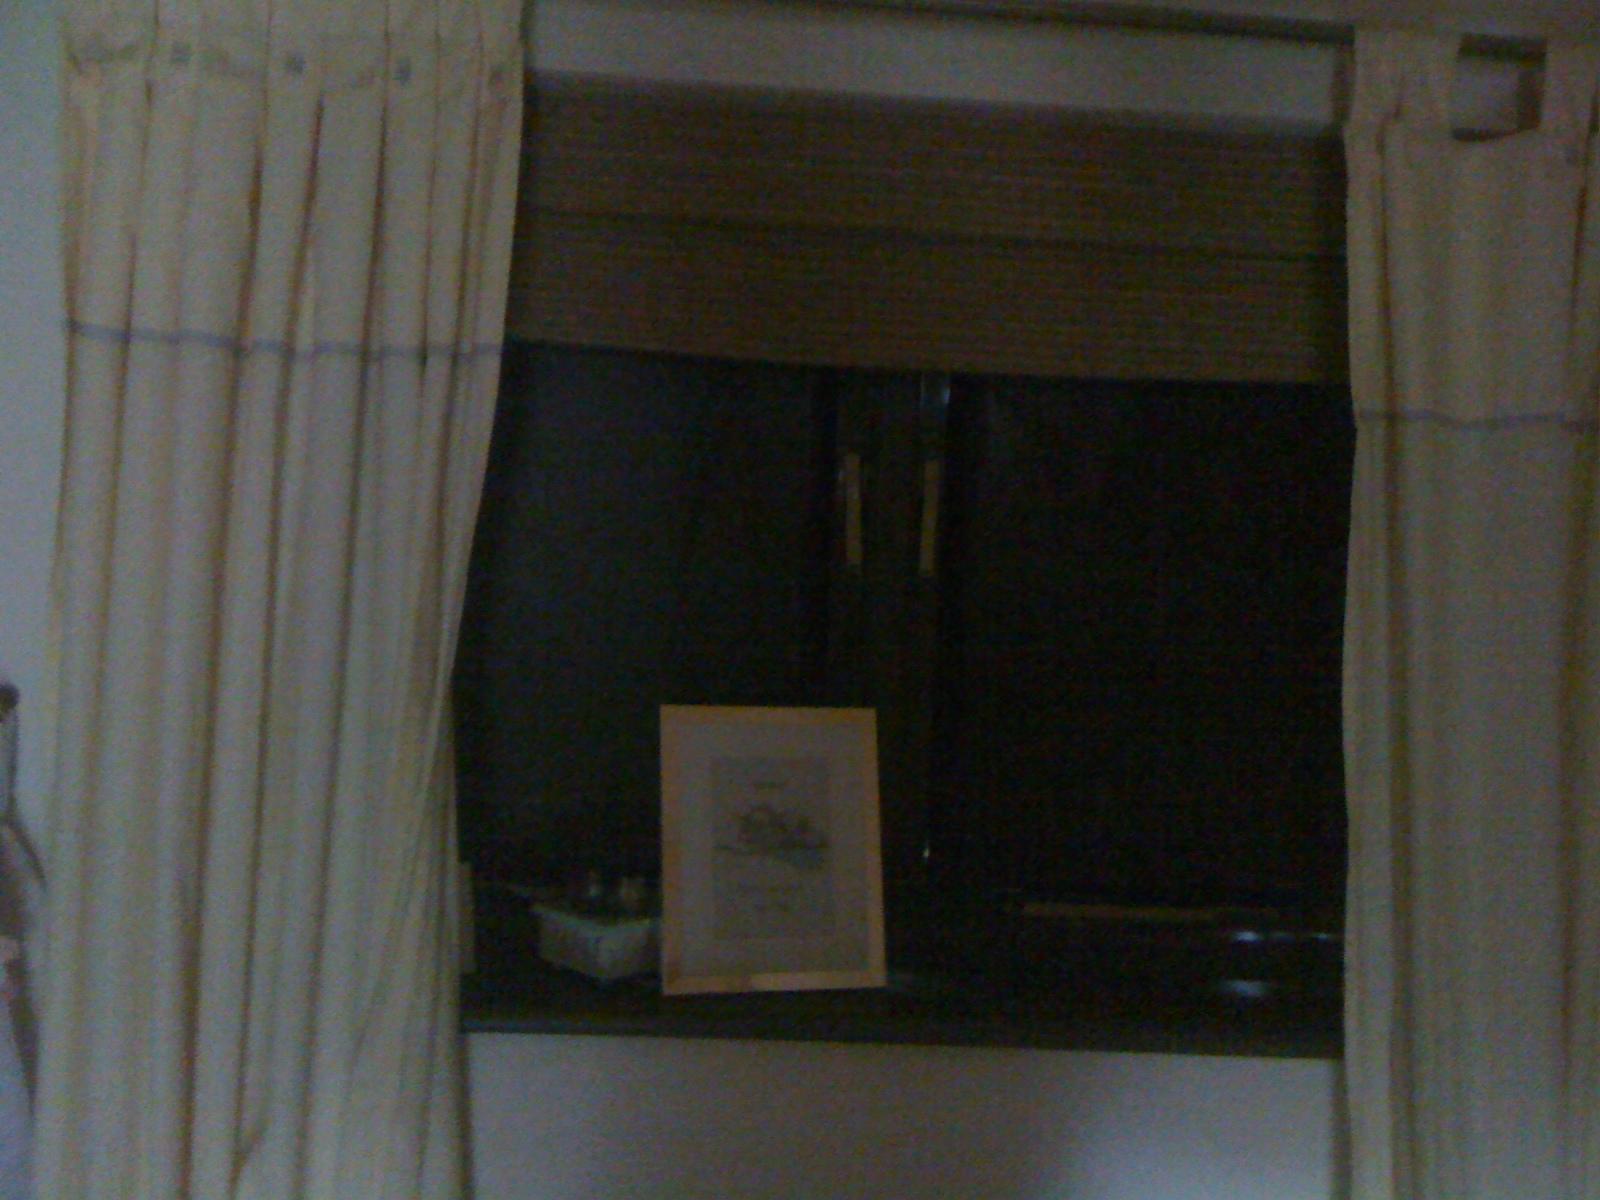 Magic Blackout Blind on both windows